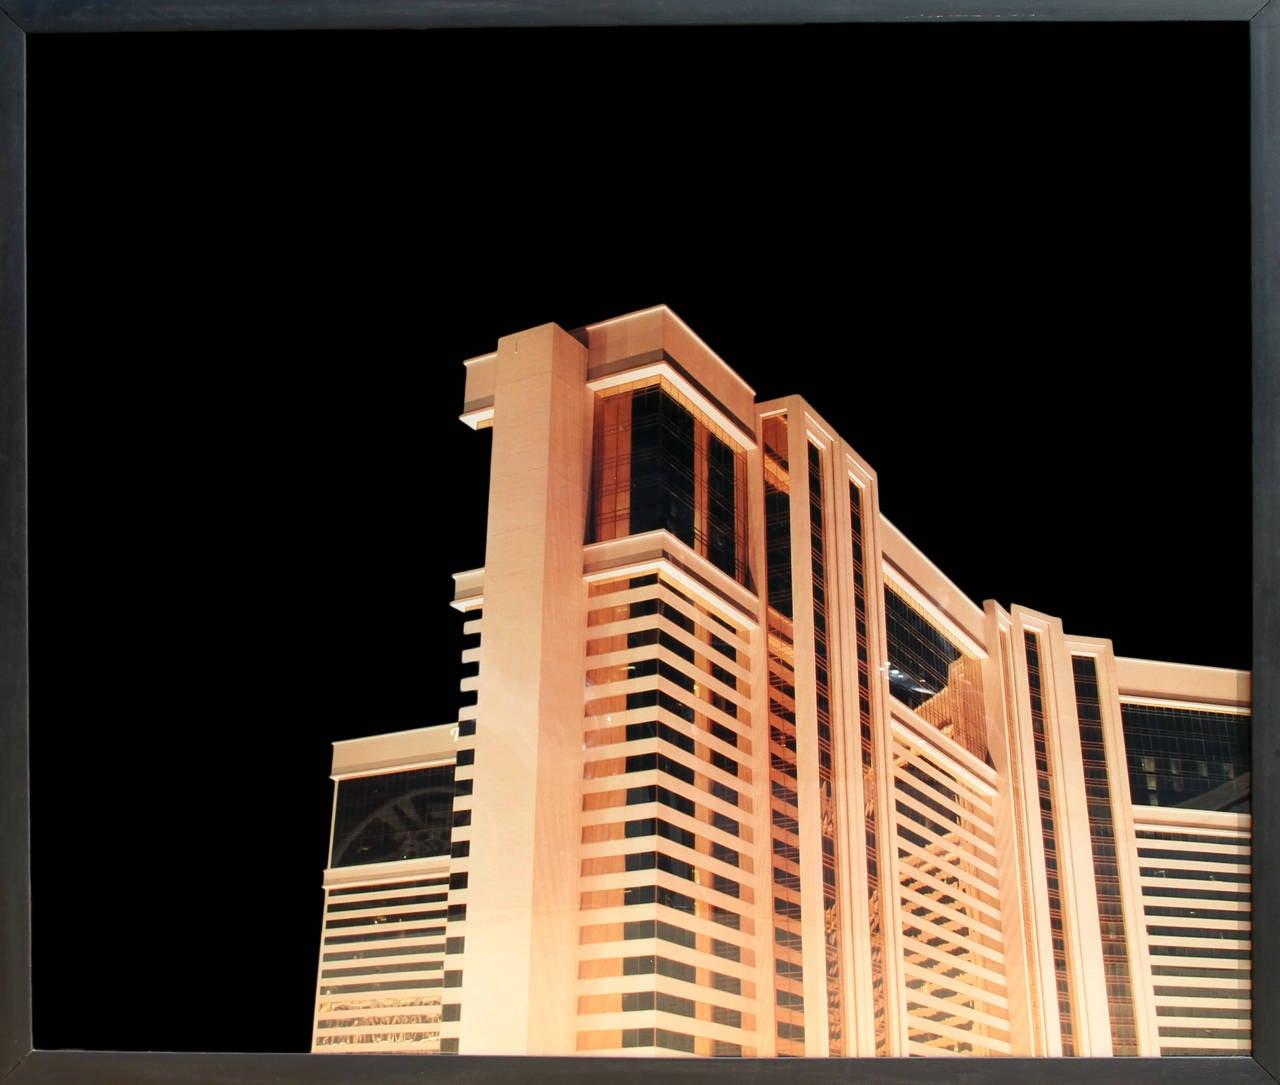 Unknown Landscape Photograph - The Mirage Hotel and Casino, Las Vegas